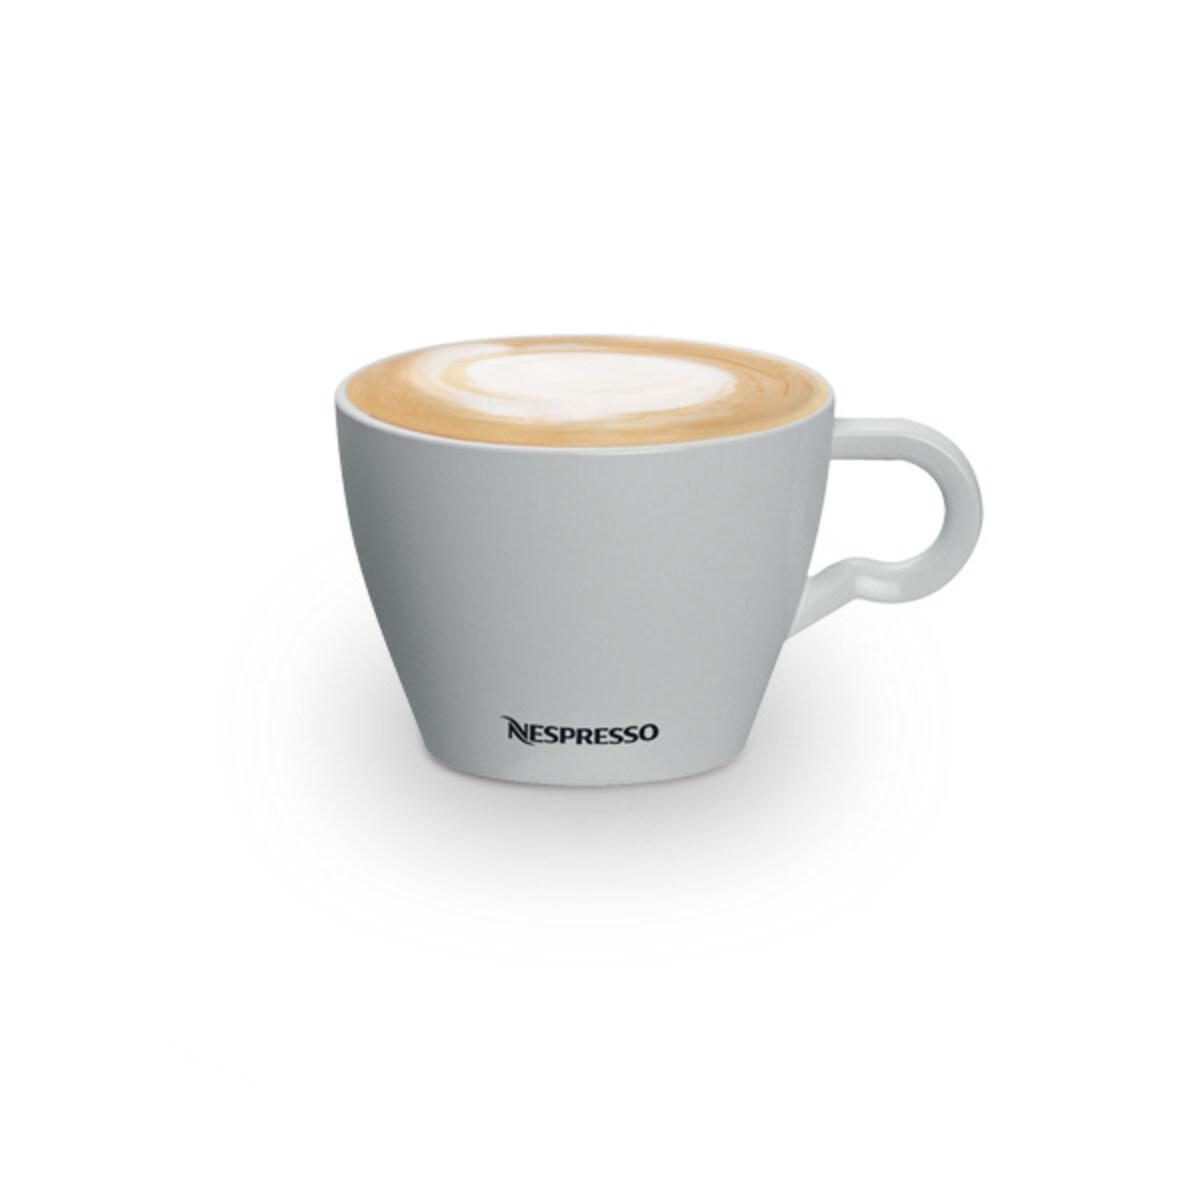 Nespresso Professional Cappuccino Cup Порцеланова чаша   1бр